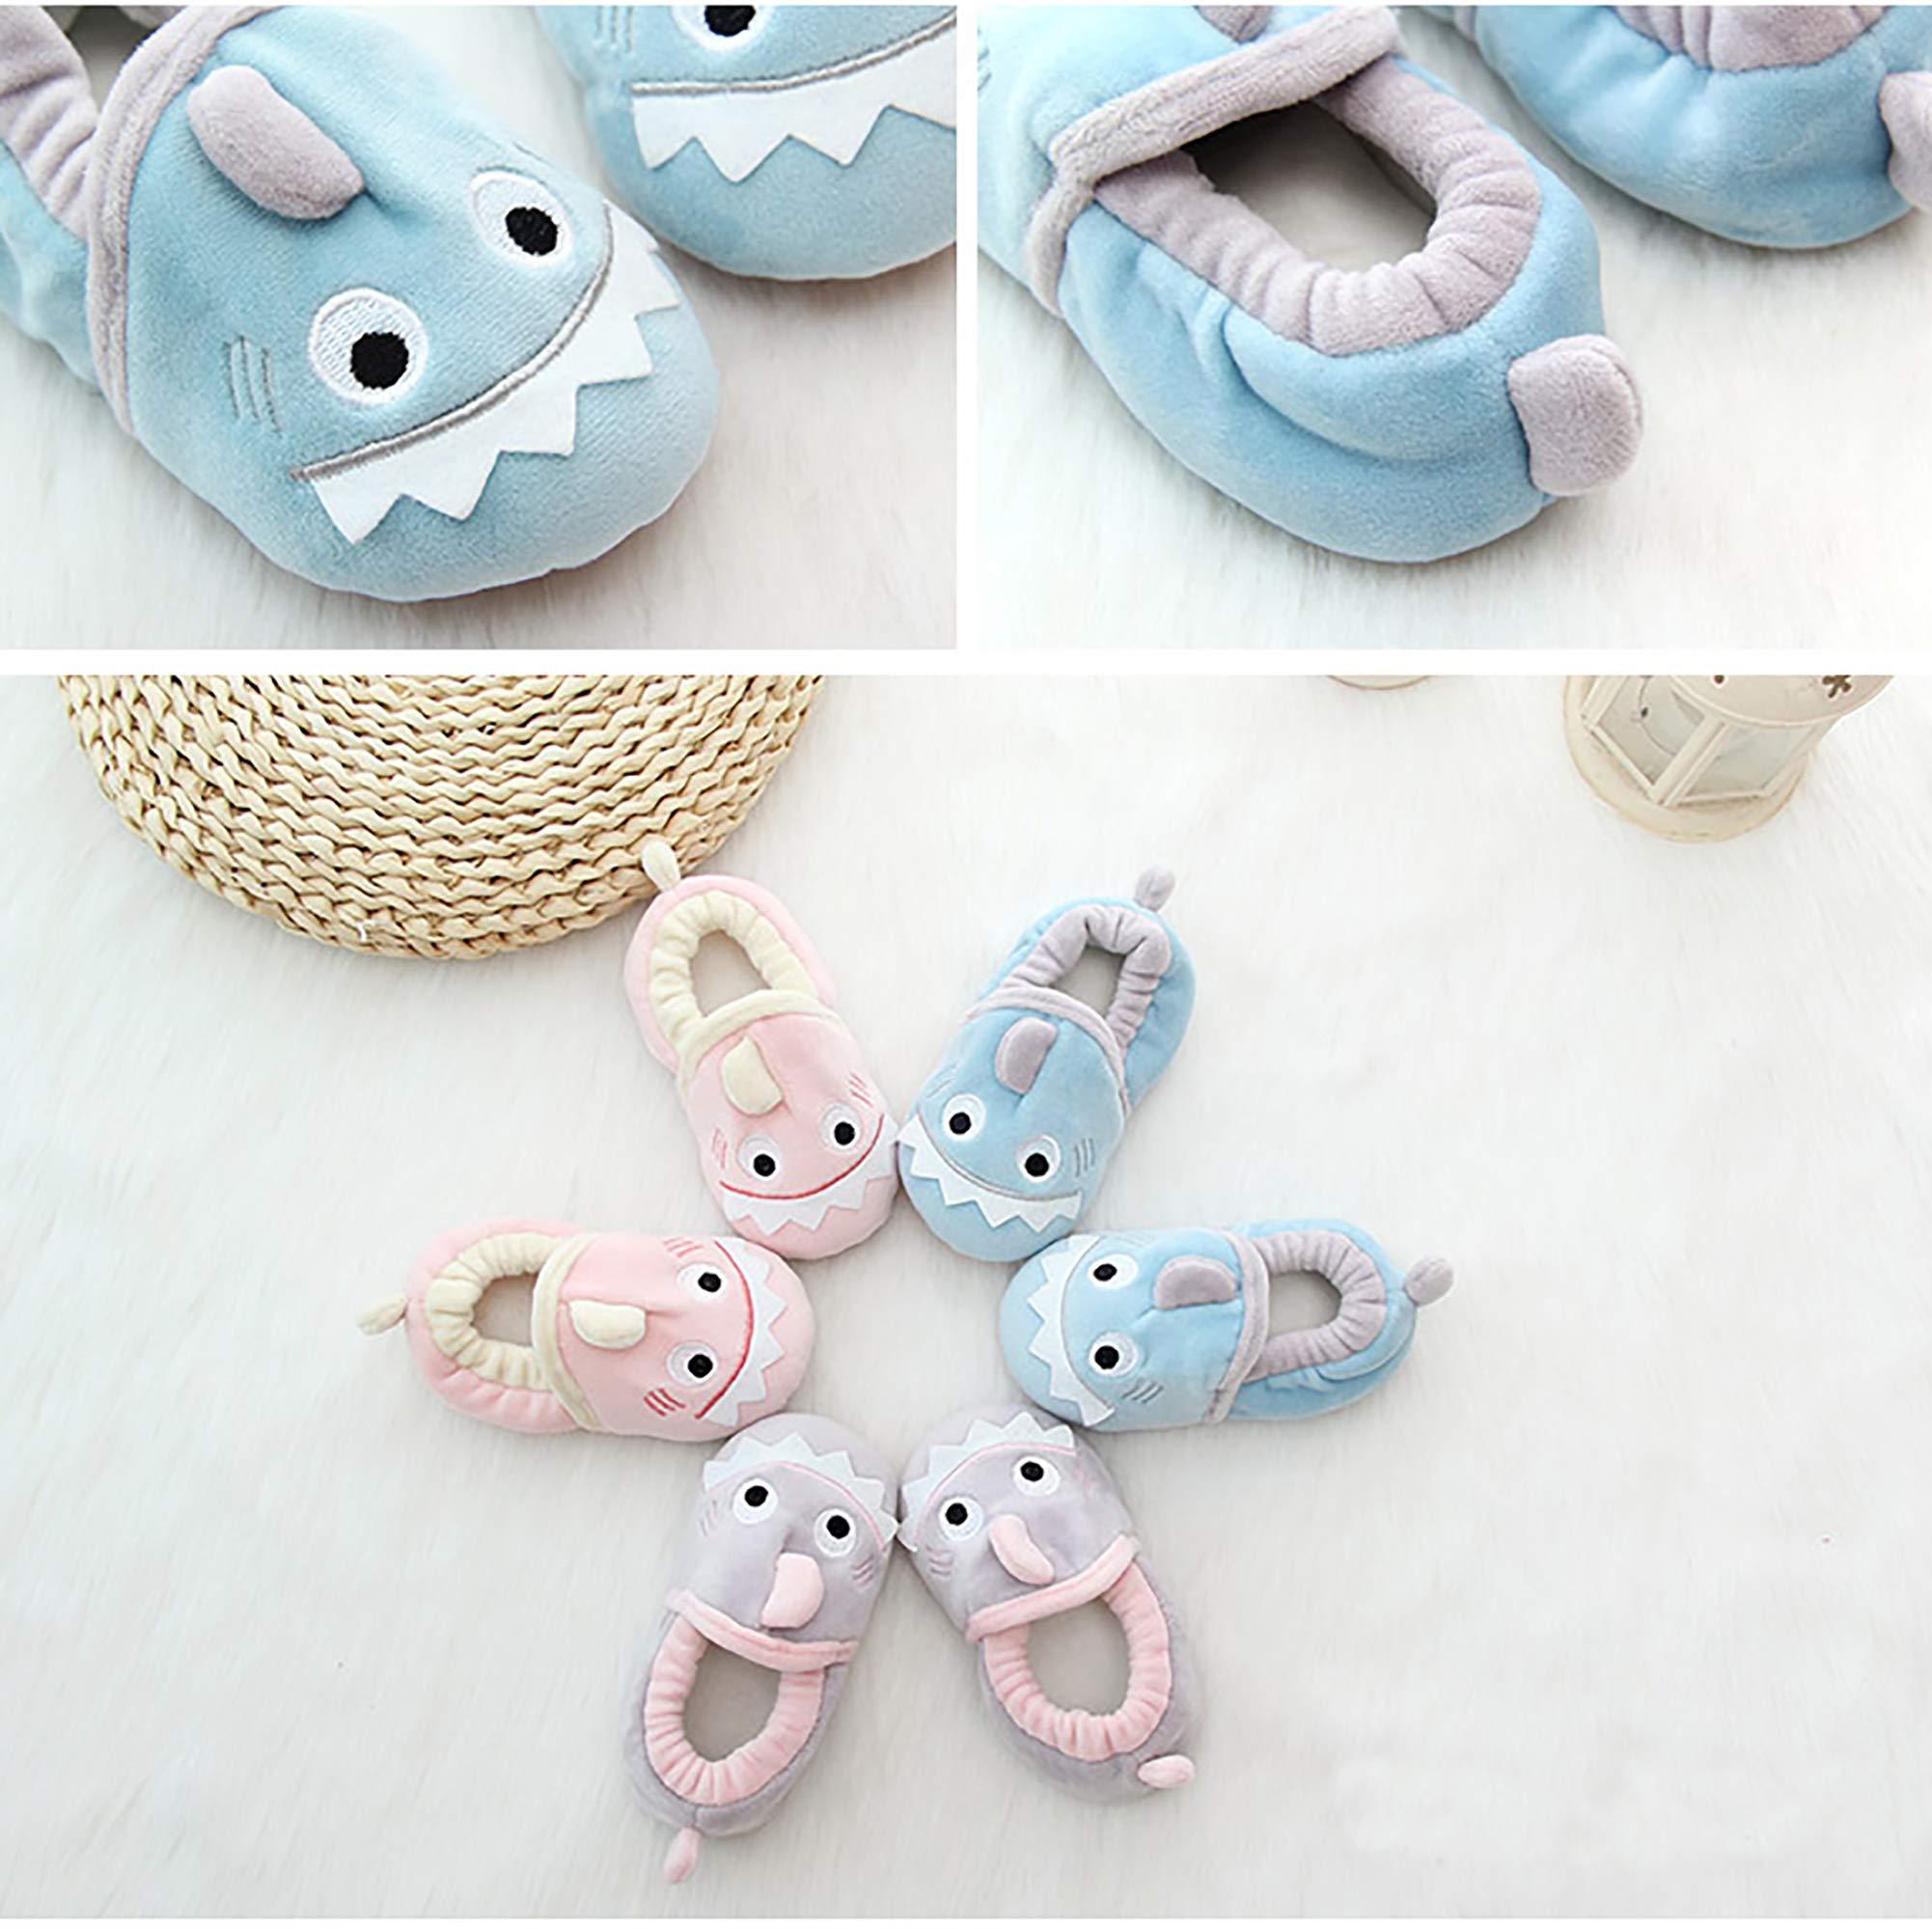 SDBING Toddler Baby Boys Girls Cute Cartoon Shark Shoes Soft Anti-slip Winter Home Slippers 6-24 Months (12-18 Months, Cute Shark Pink) by SDBING (Image #4)